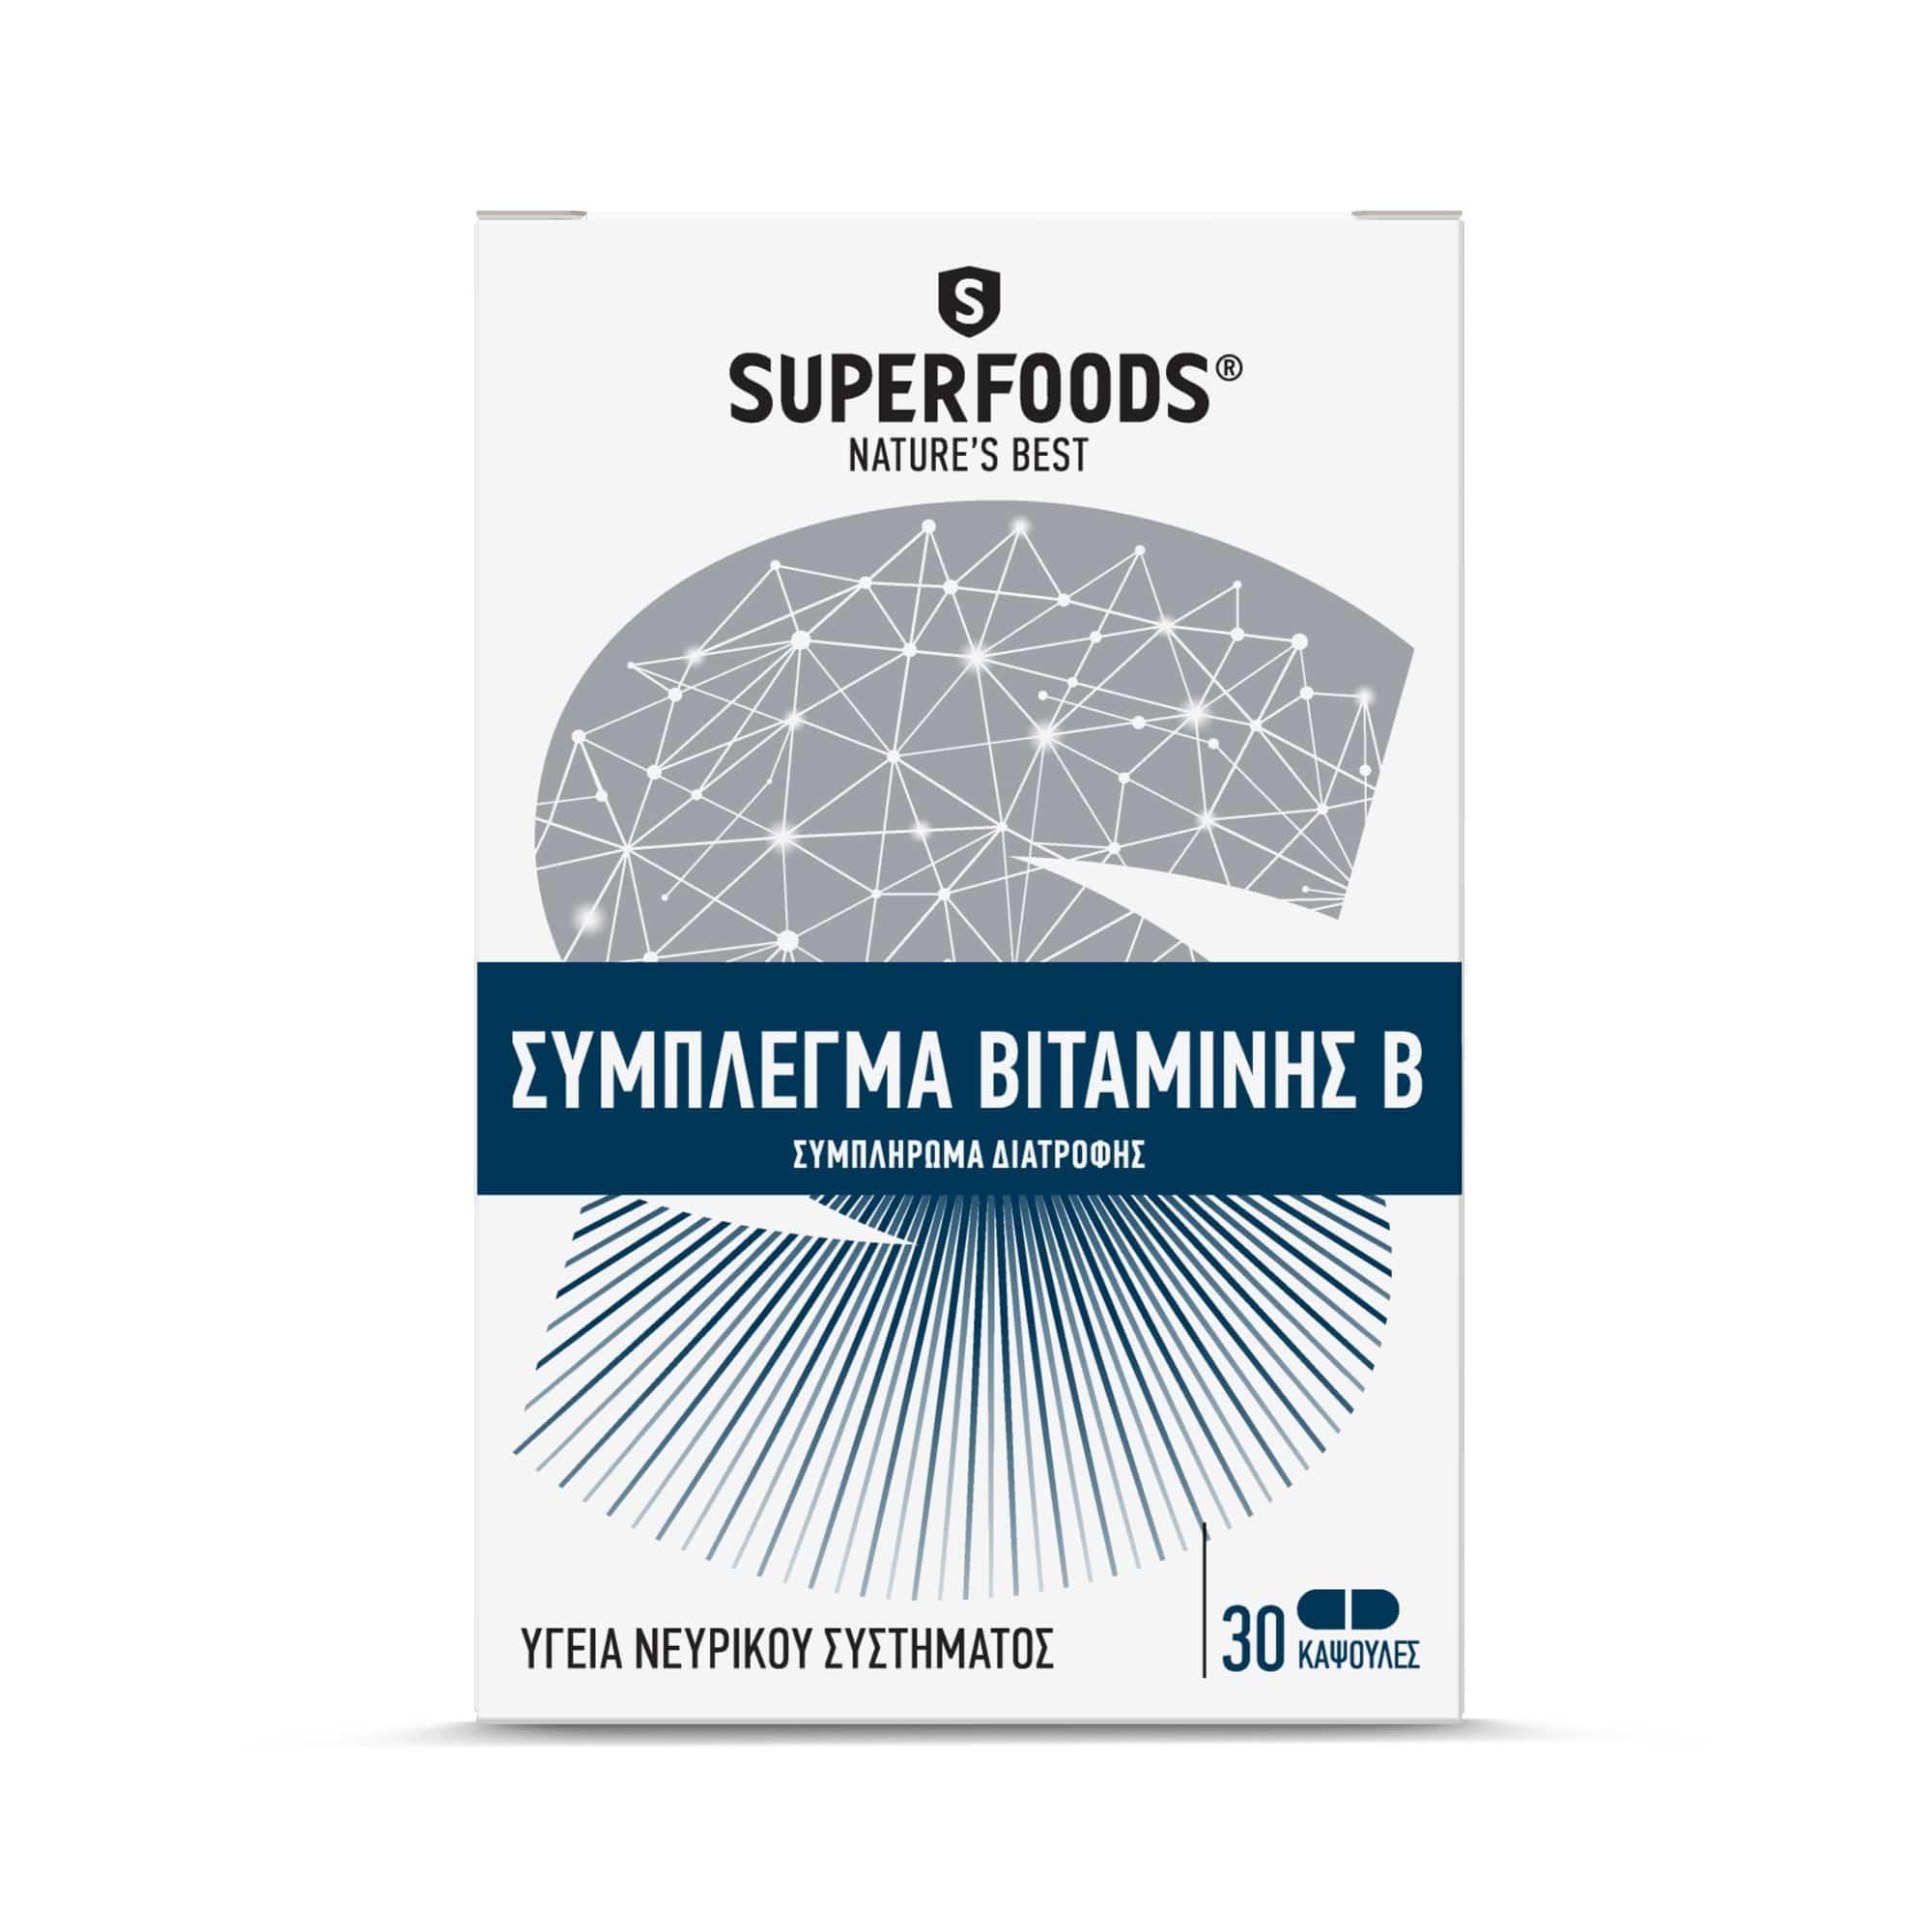 Superfoods Σύμπλεγμα Βιταμινών B